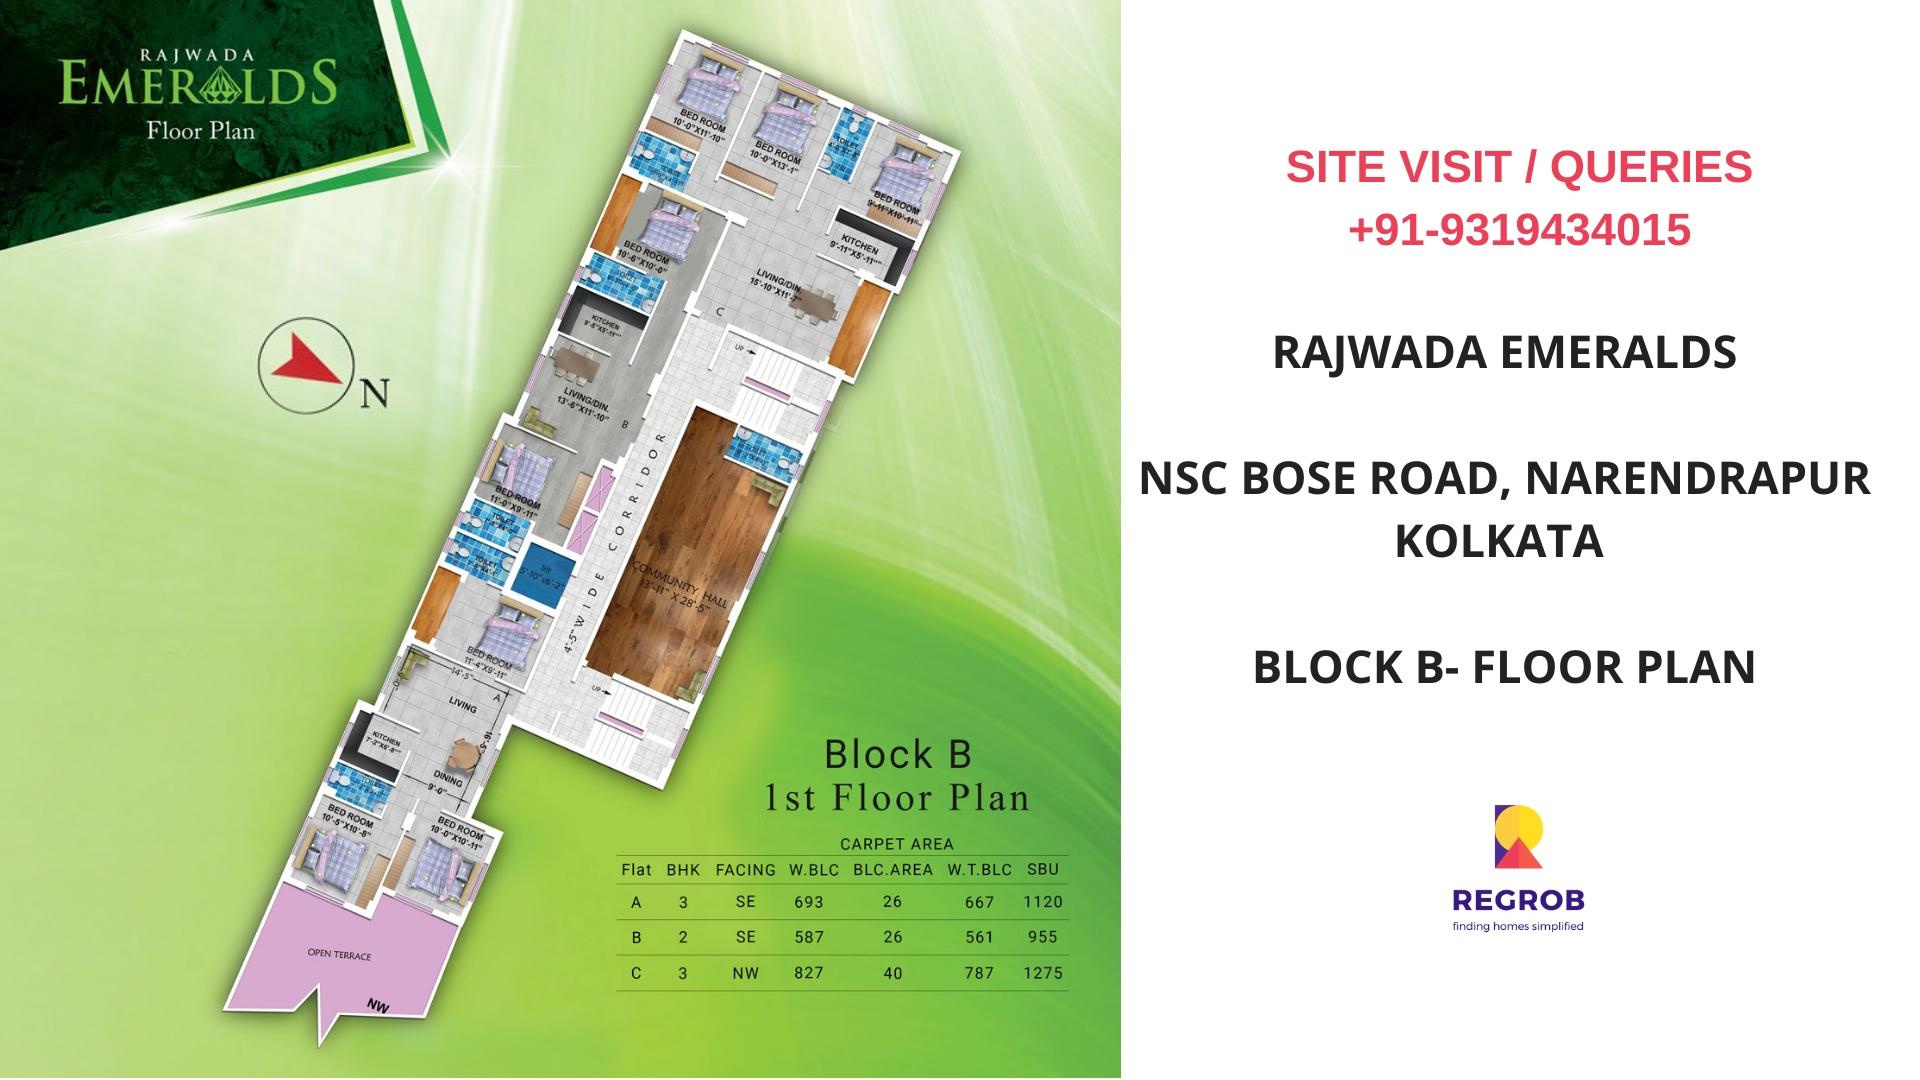 Rajwada Emeralds Narendrapur Kolkata